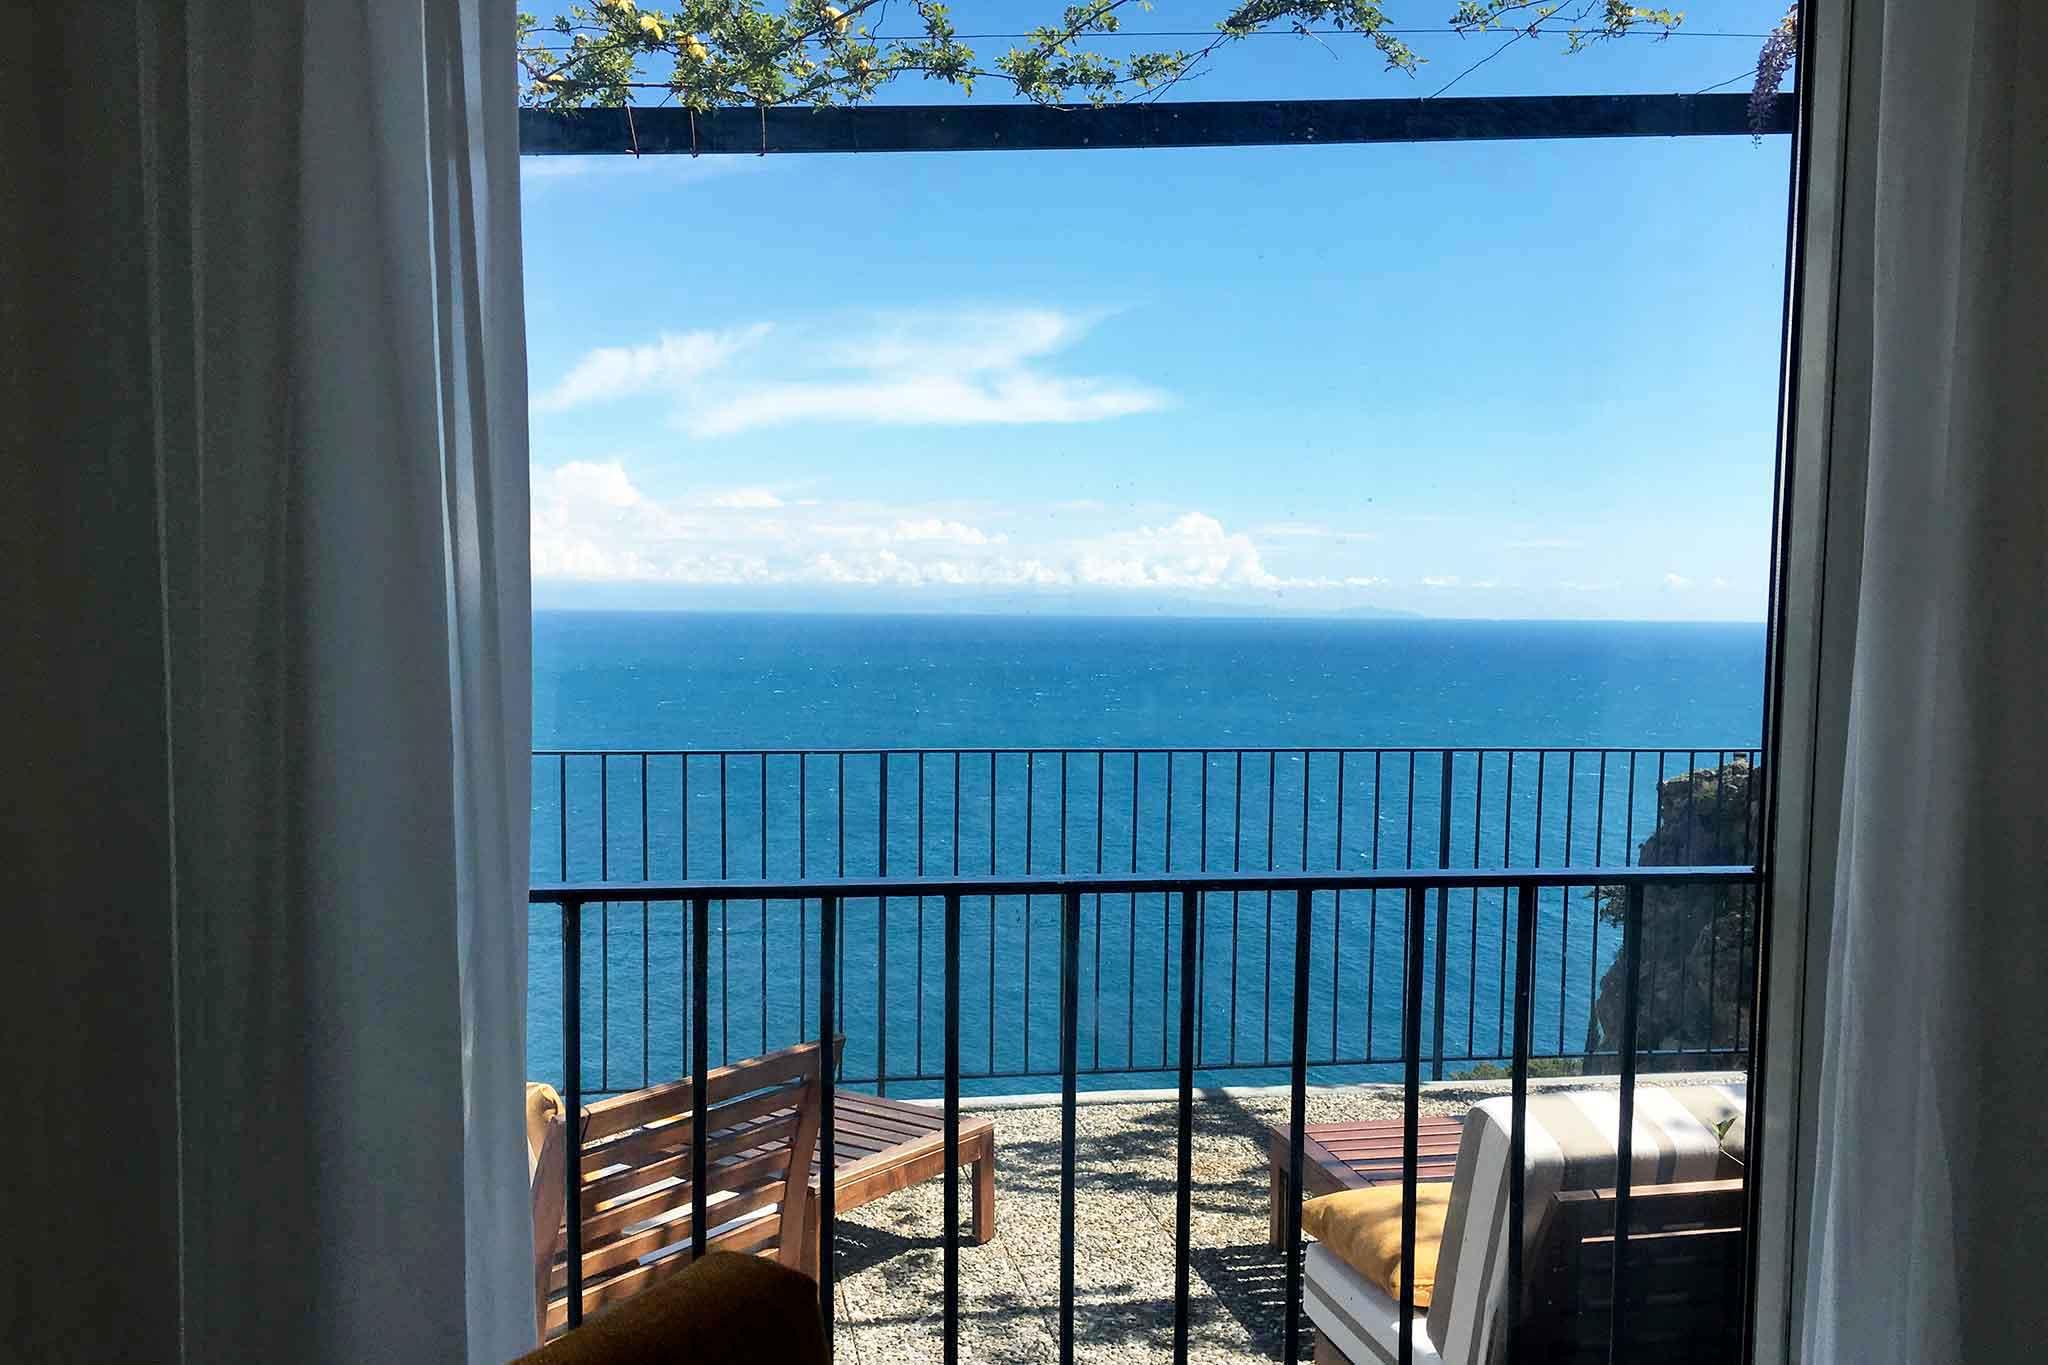 Ciccio ristorante Amalfi vista